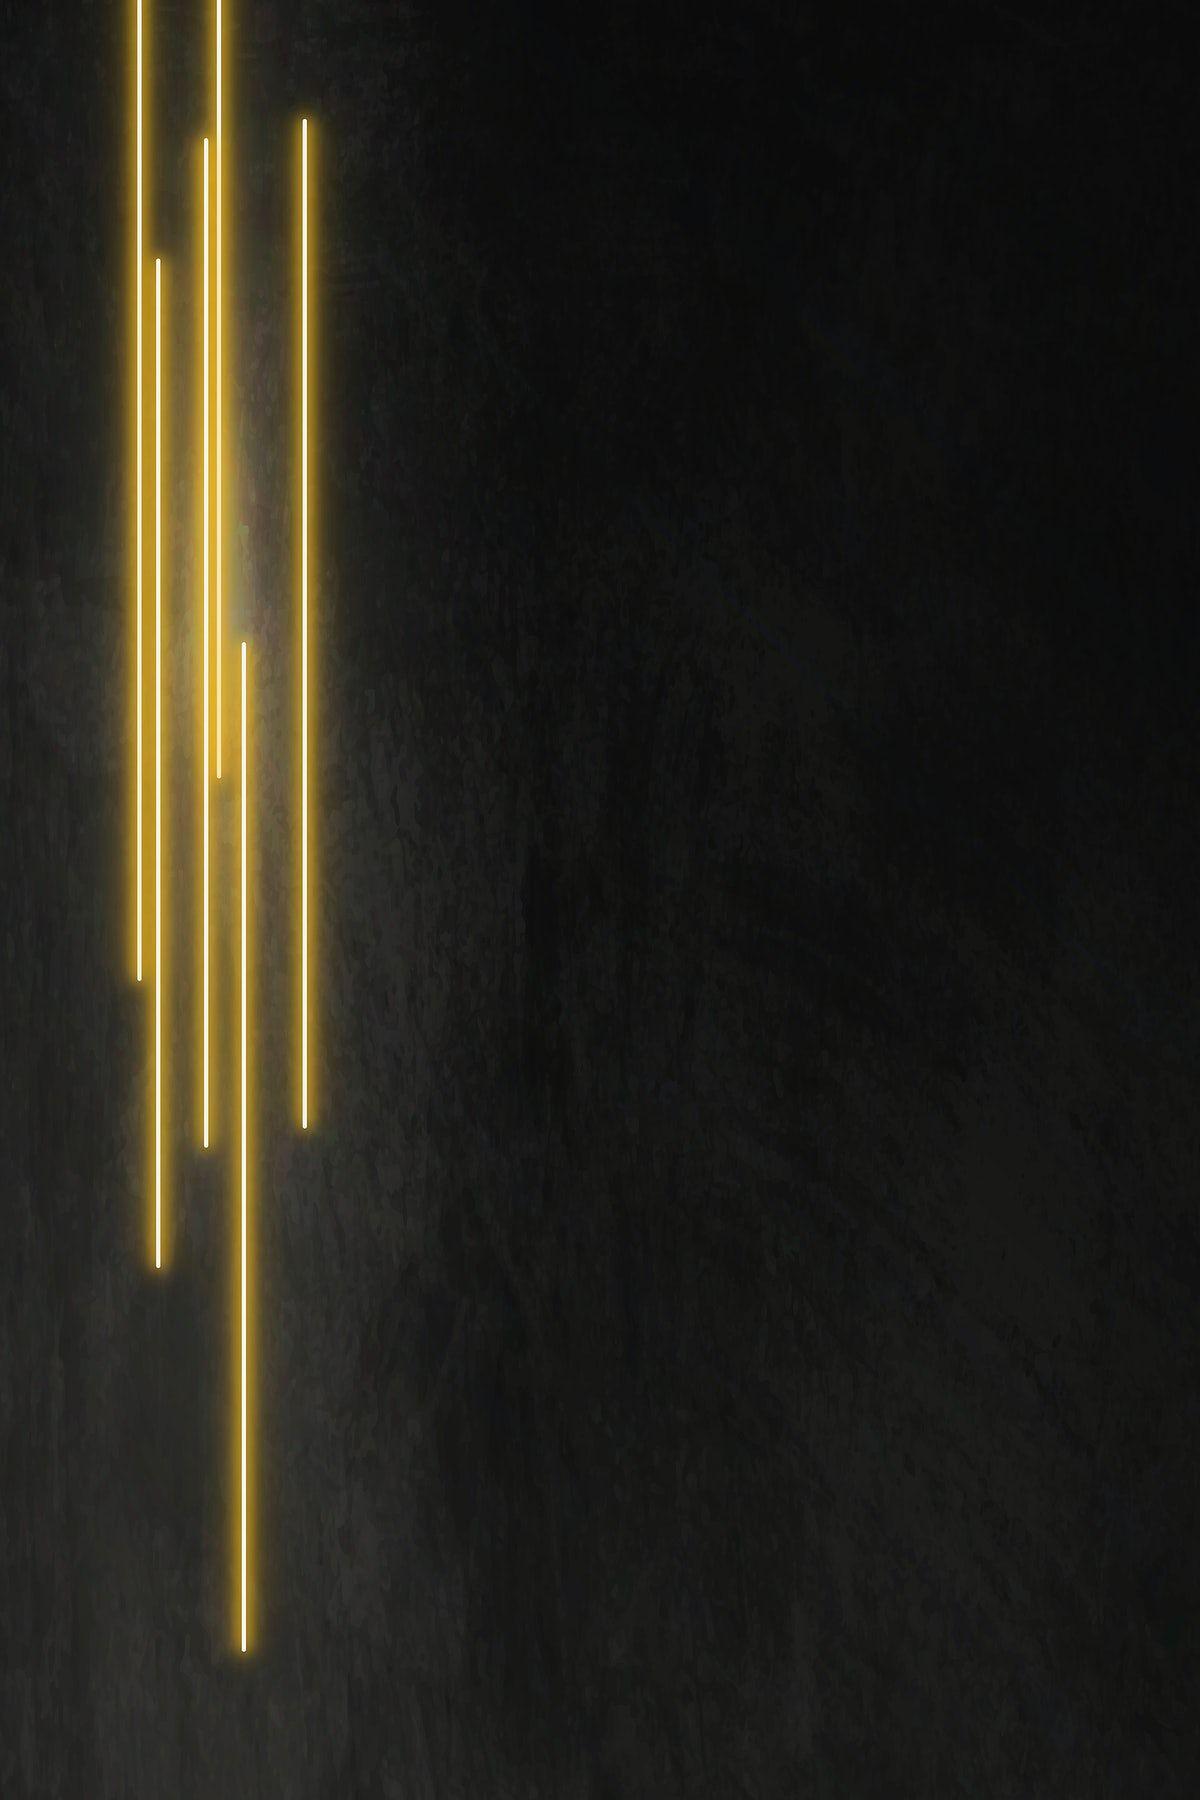 Download Premium Vector Of Yellow Glowing Lines On Black Background Vector In 2020 Black Background Wallpaper Black Background Images Gold Wallpaper Hd